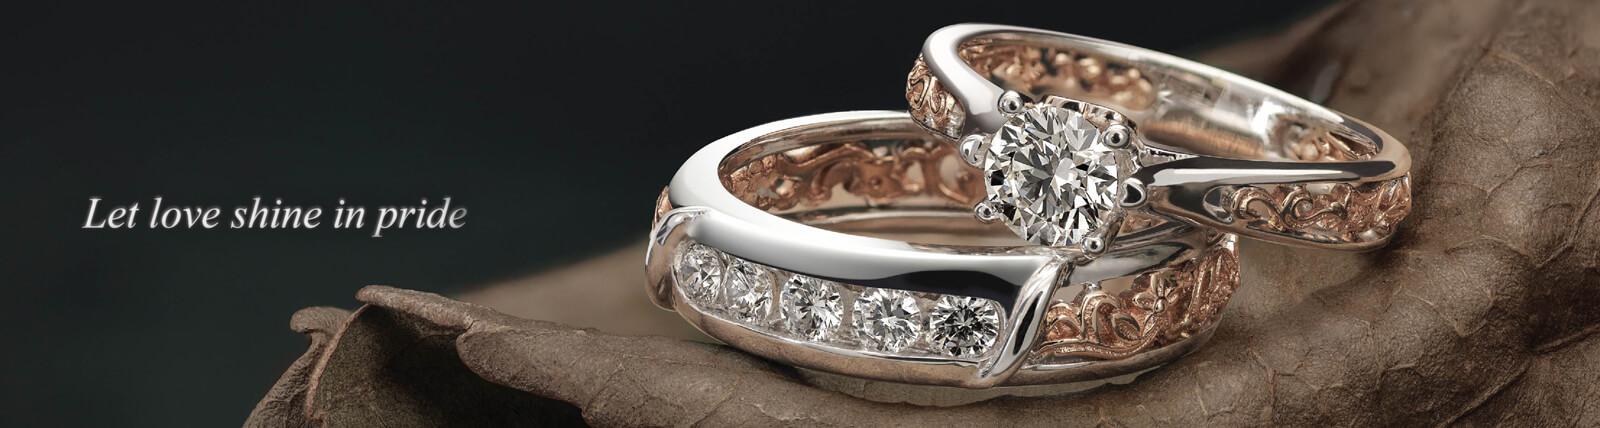 diamondscategory_bangles_bnr.jpg